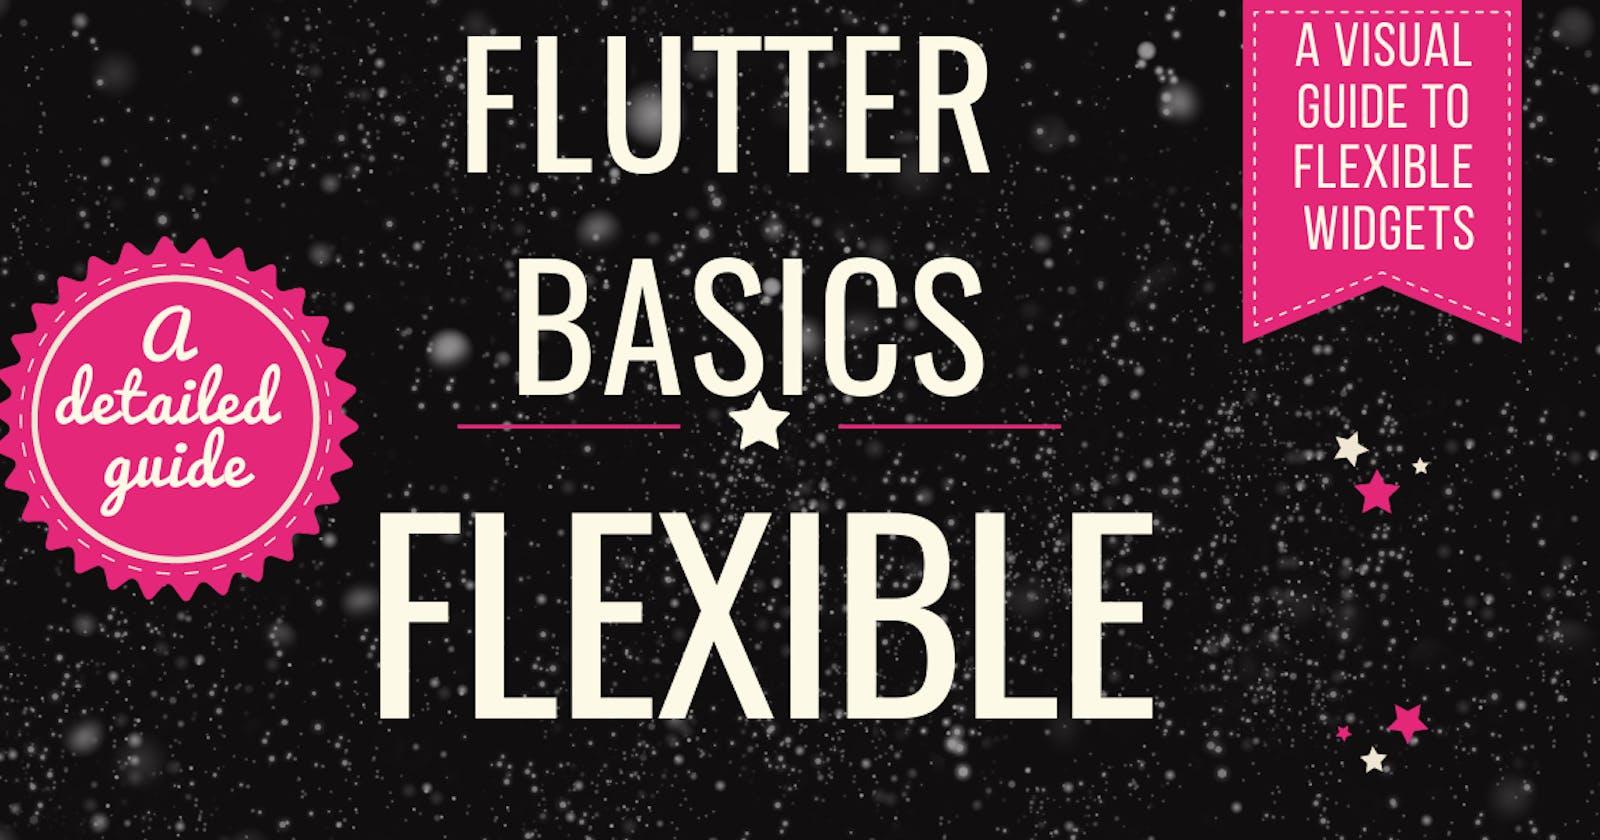 Flutter Basics: Flexible widgets